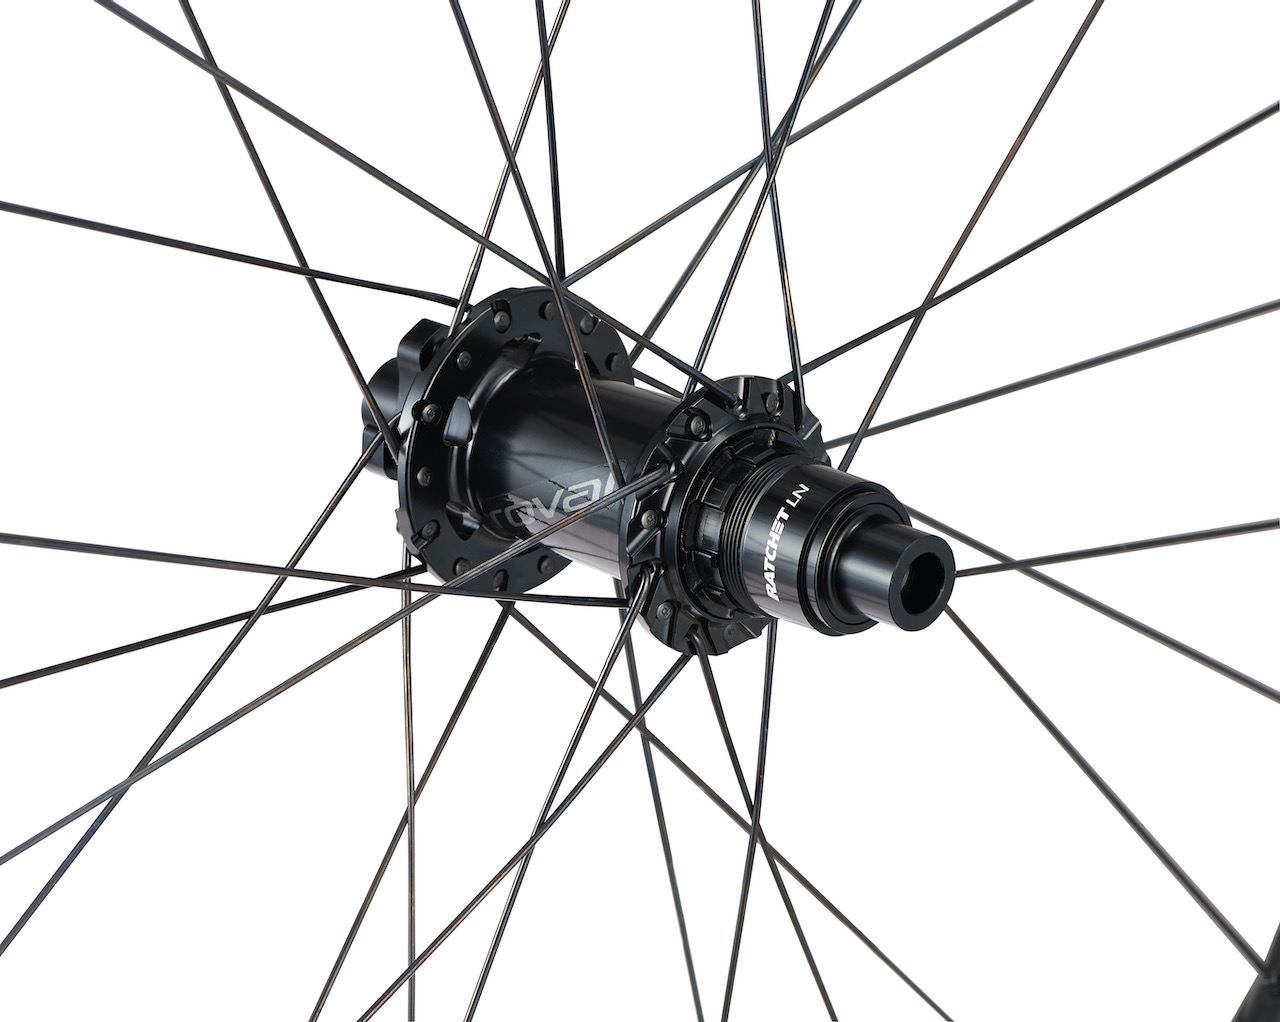 Roval Traverse Wheelset rear hub close up